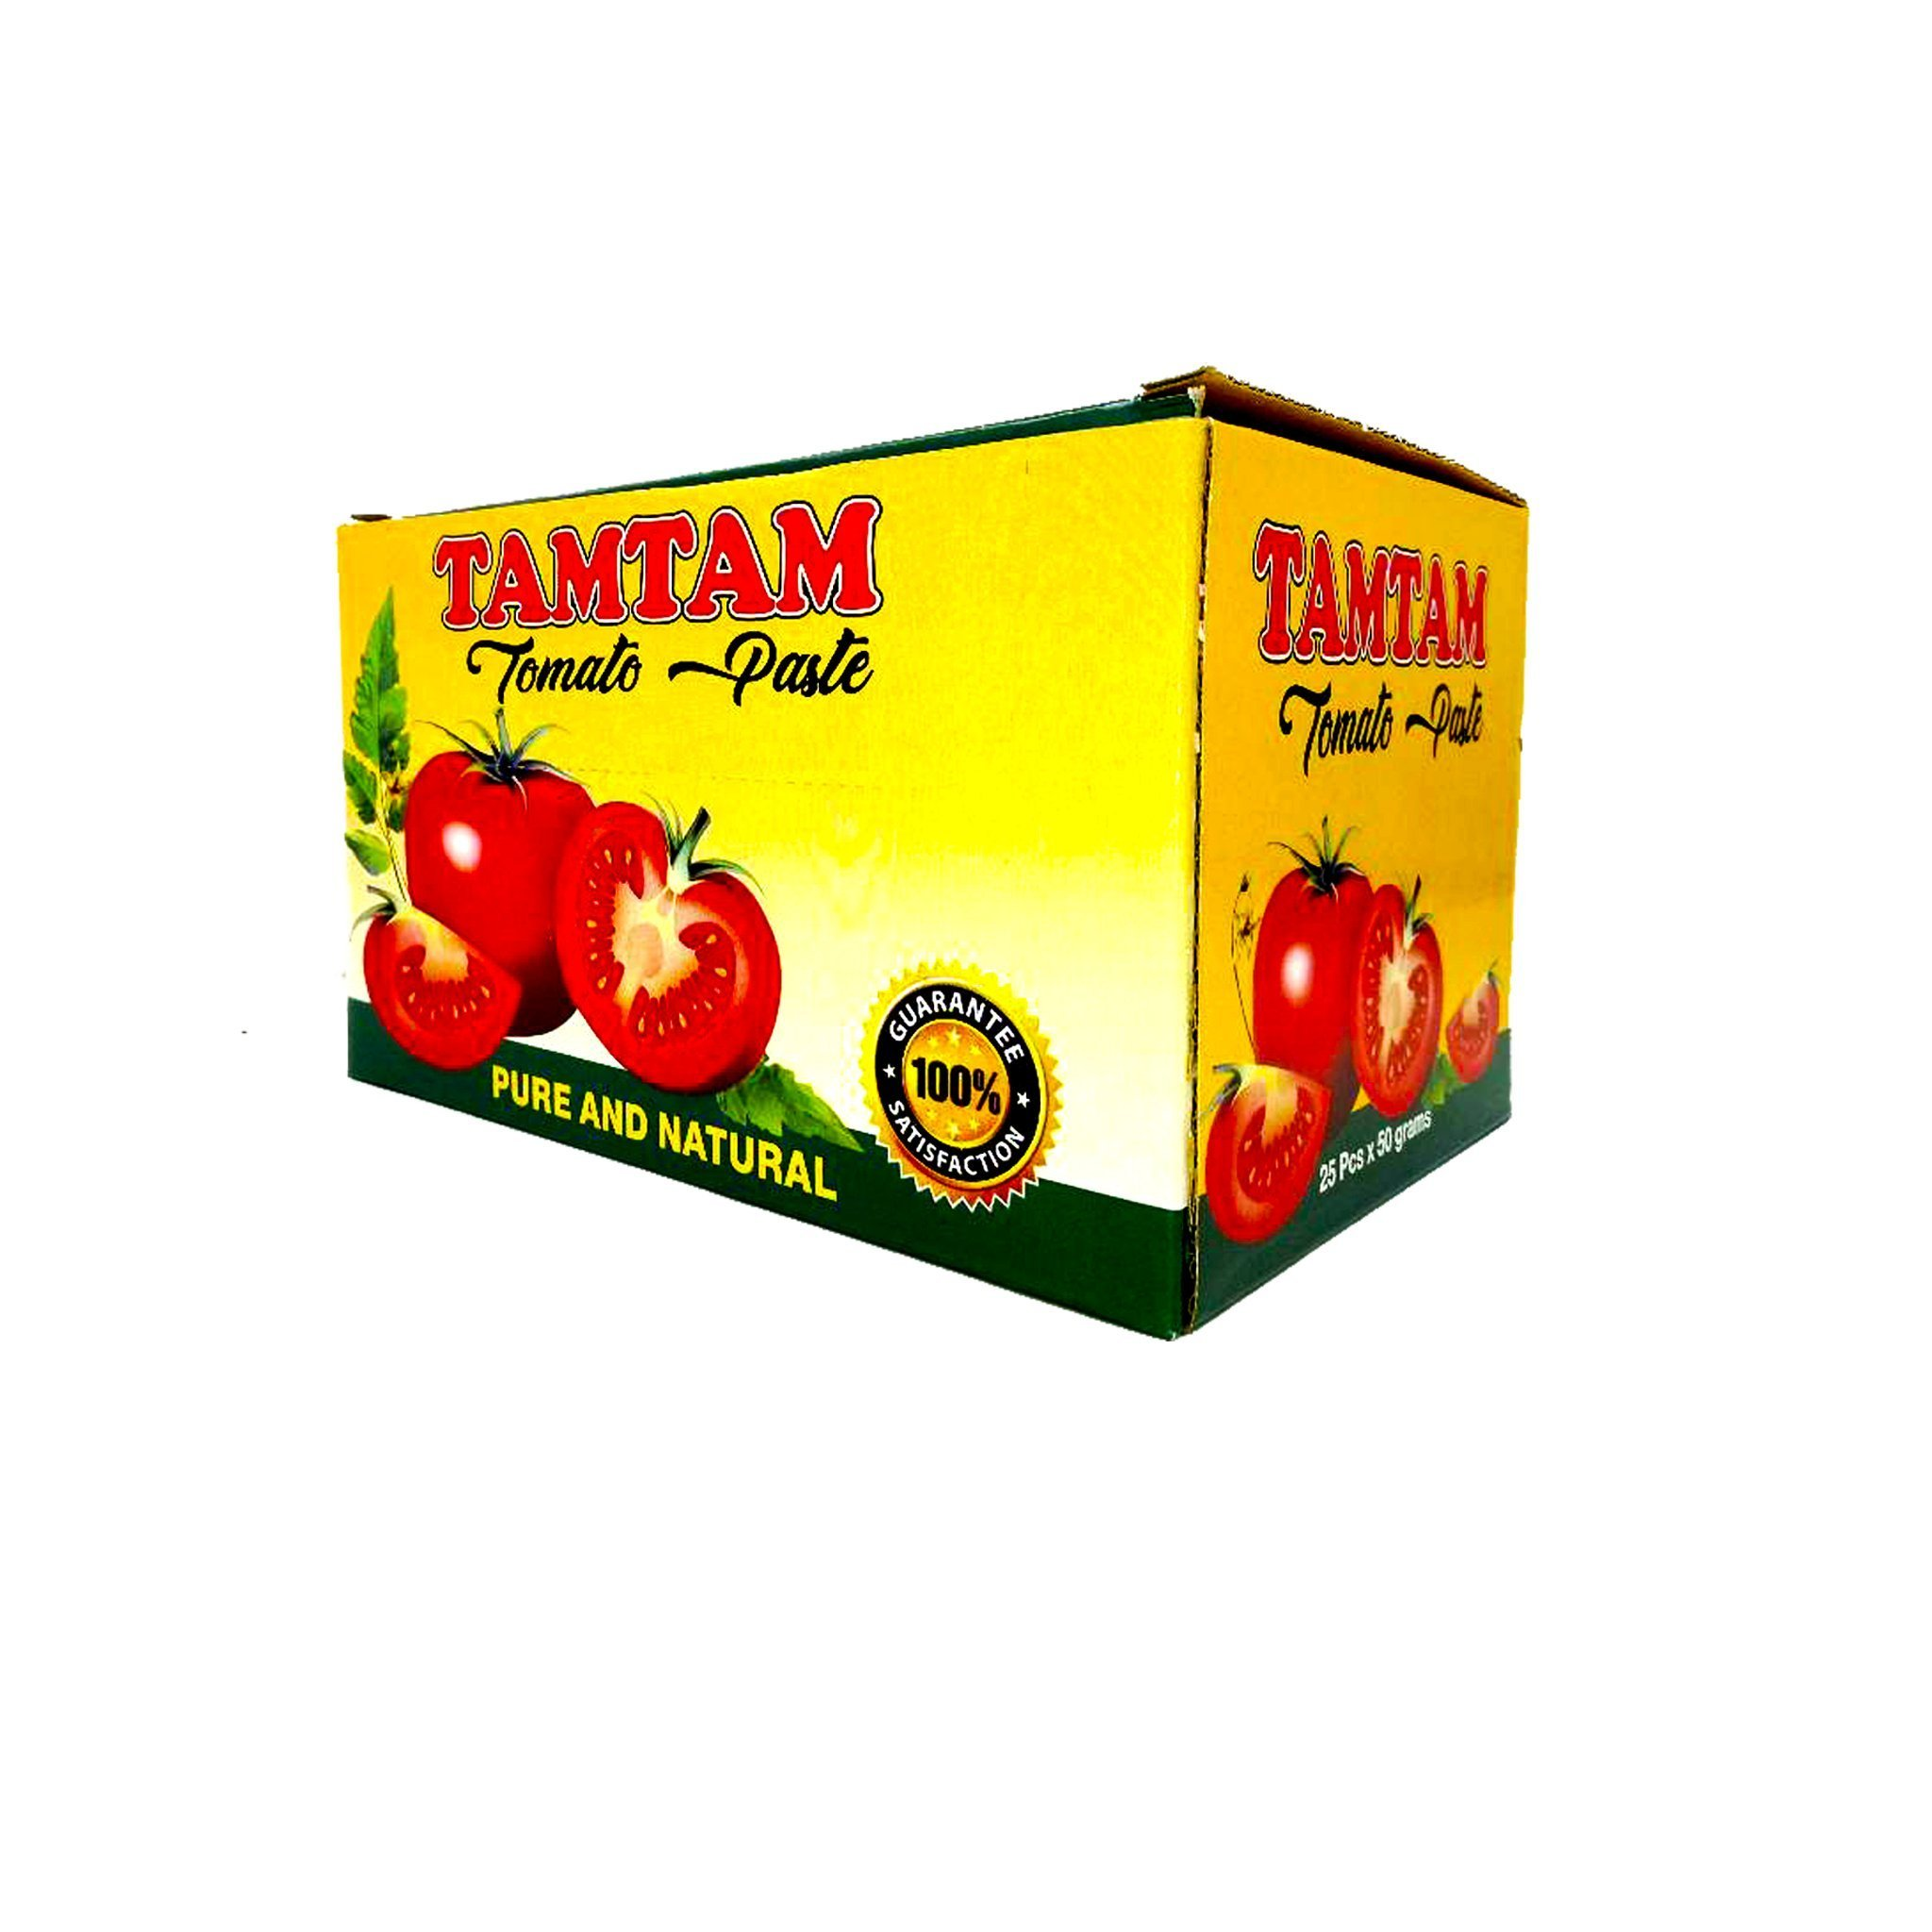 Tam Tam Tomato Paste /25pcs x 50 grams Price: 3500 Rwf Delivery Fees: 1000 Rwf